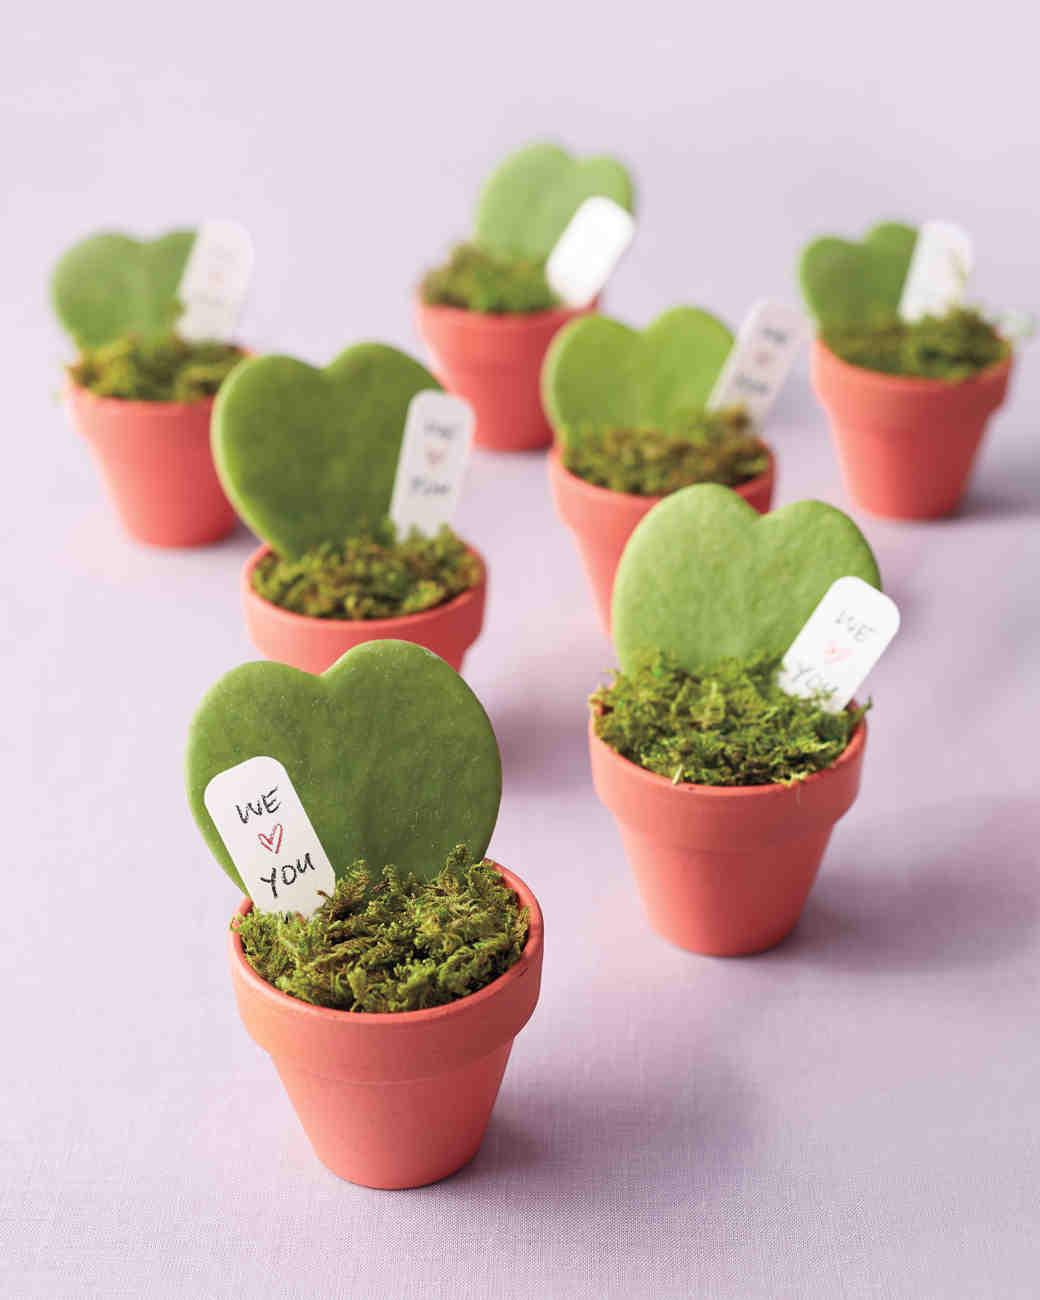 hoya-plants-005-d111375.jpg